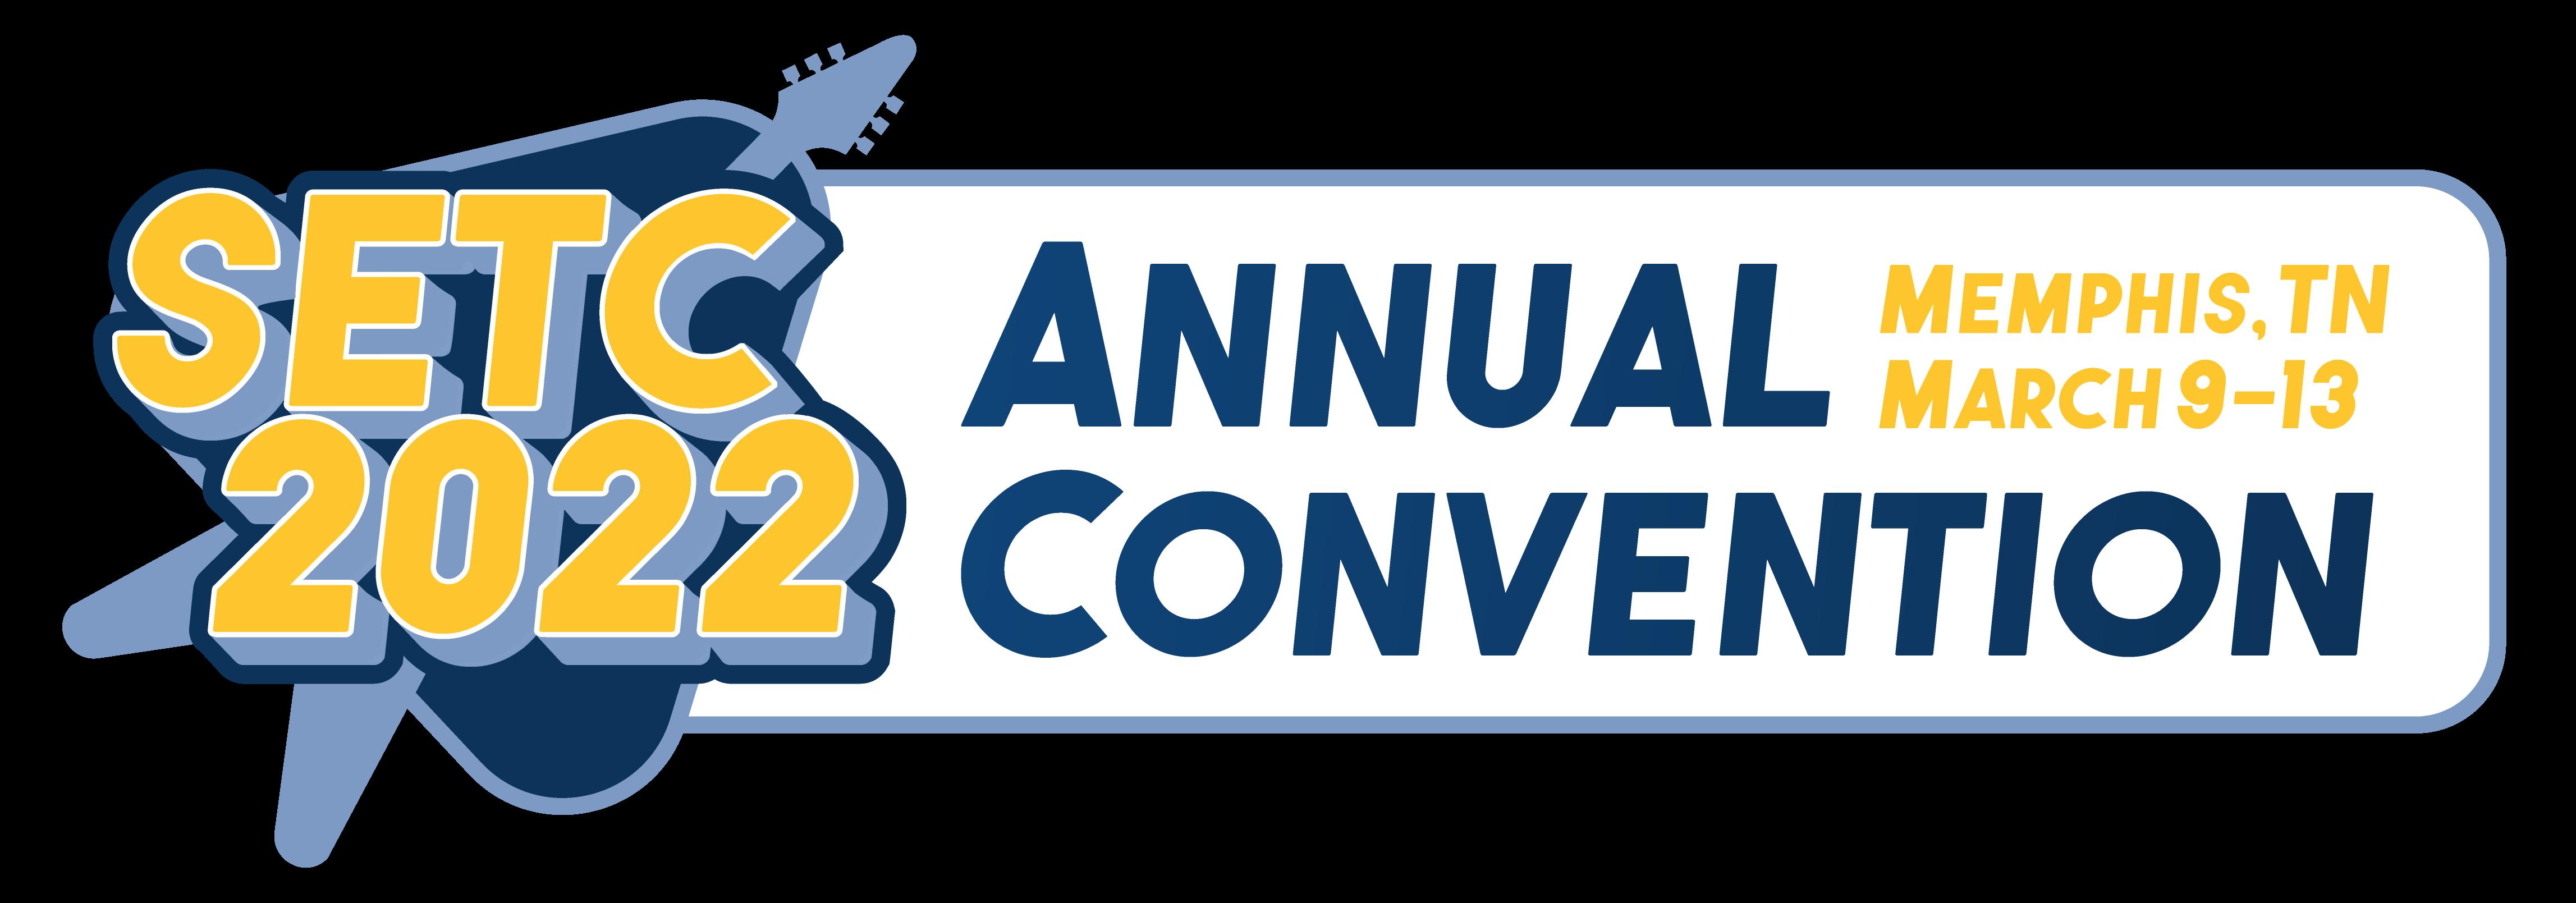 SETC Convention